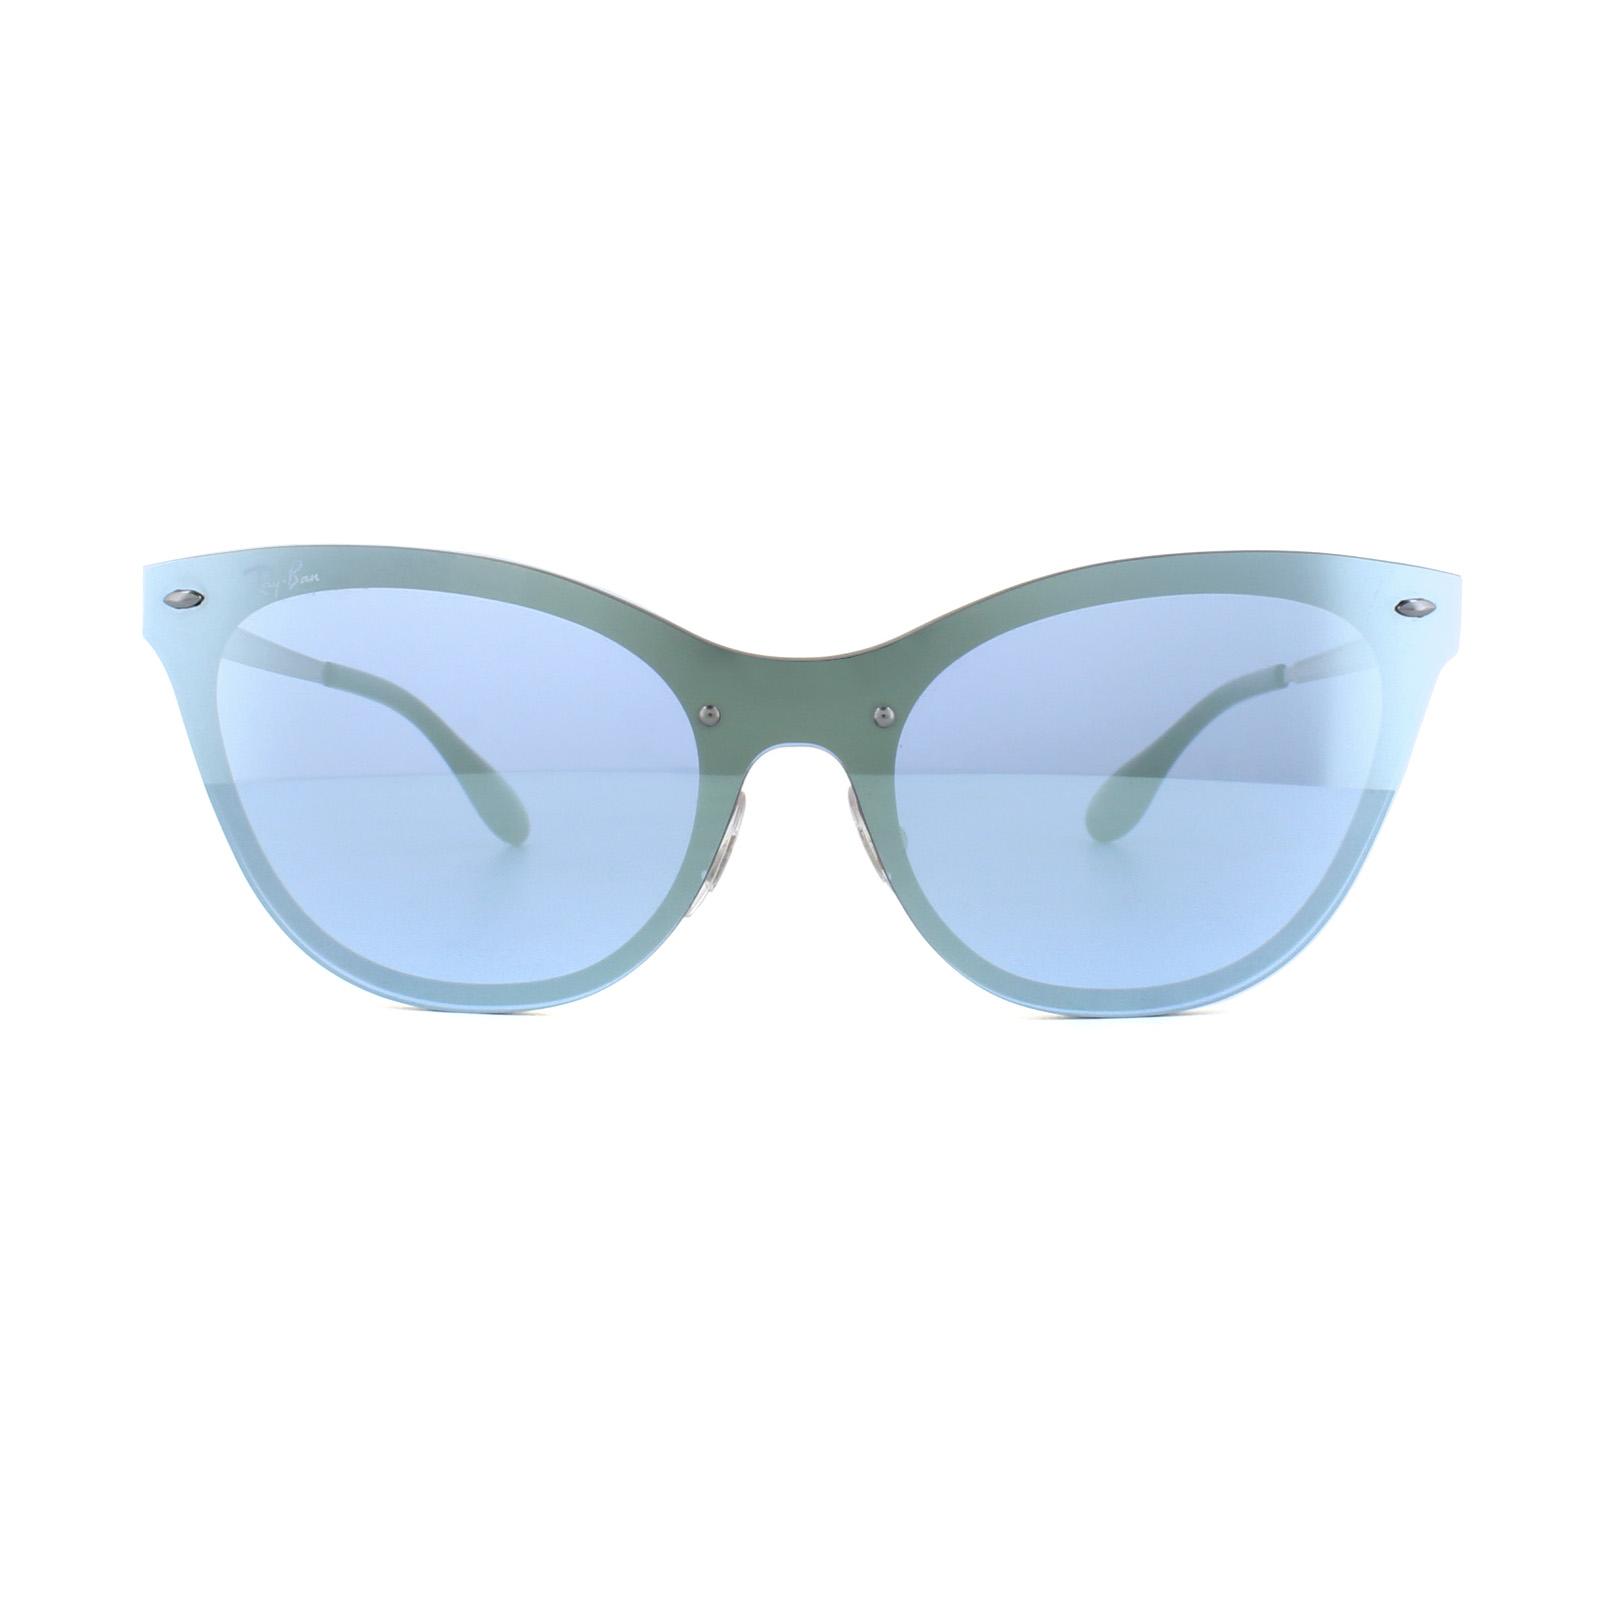 Cheap Ray-Ban Blaze Cat Eye 3580N Sunglasses - Discounted Sunglasses 4e3077ca1c1